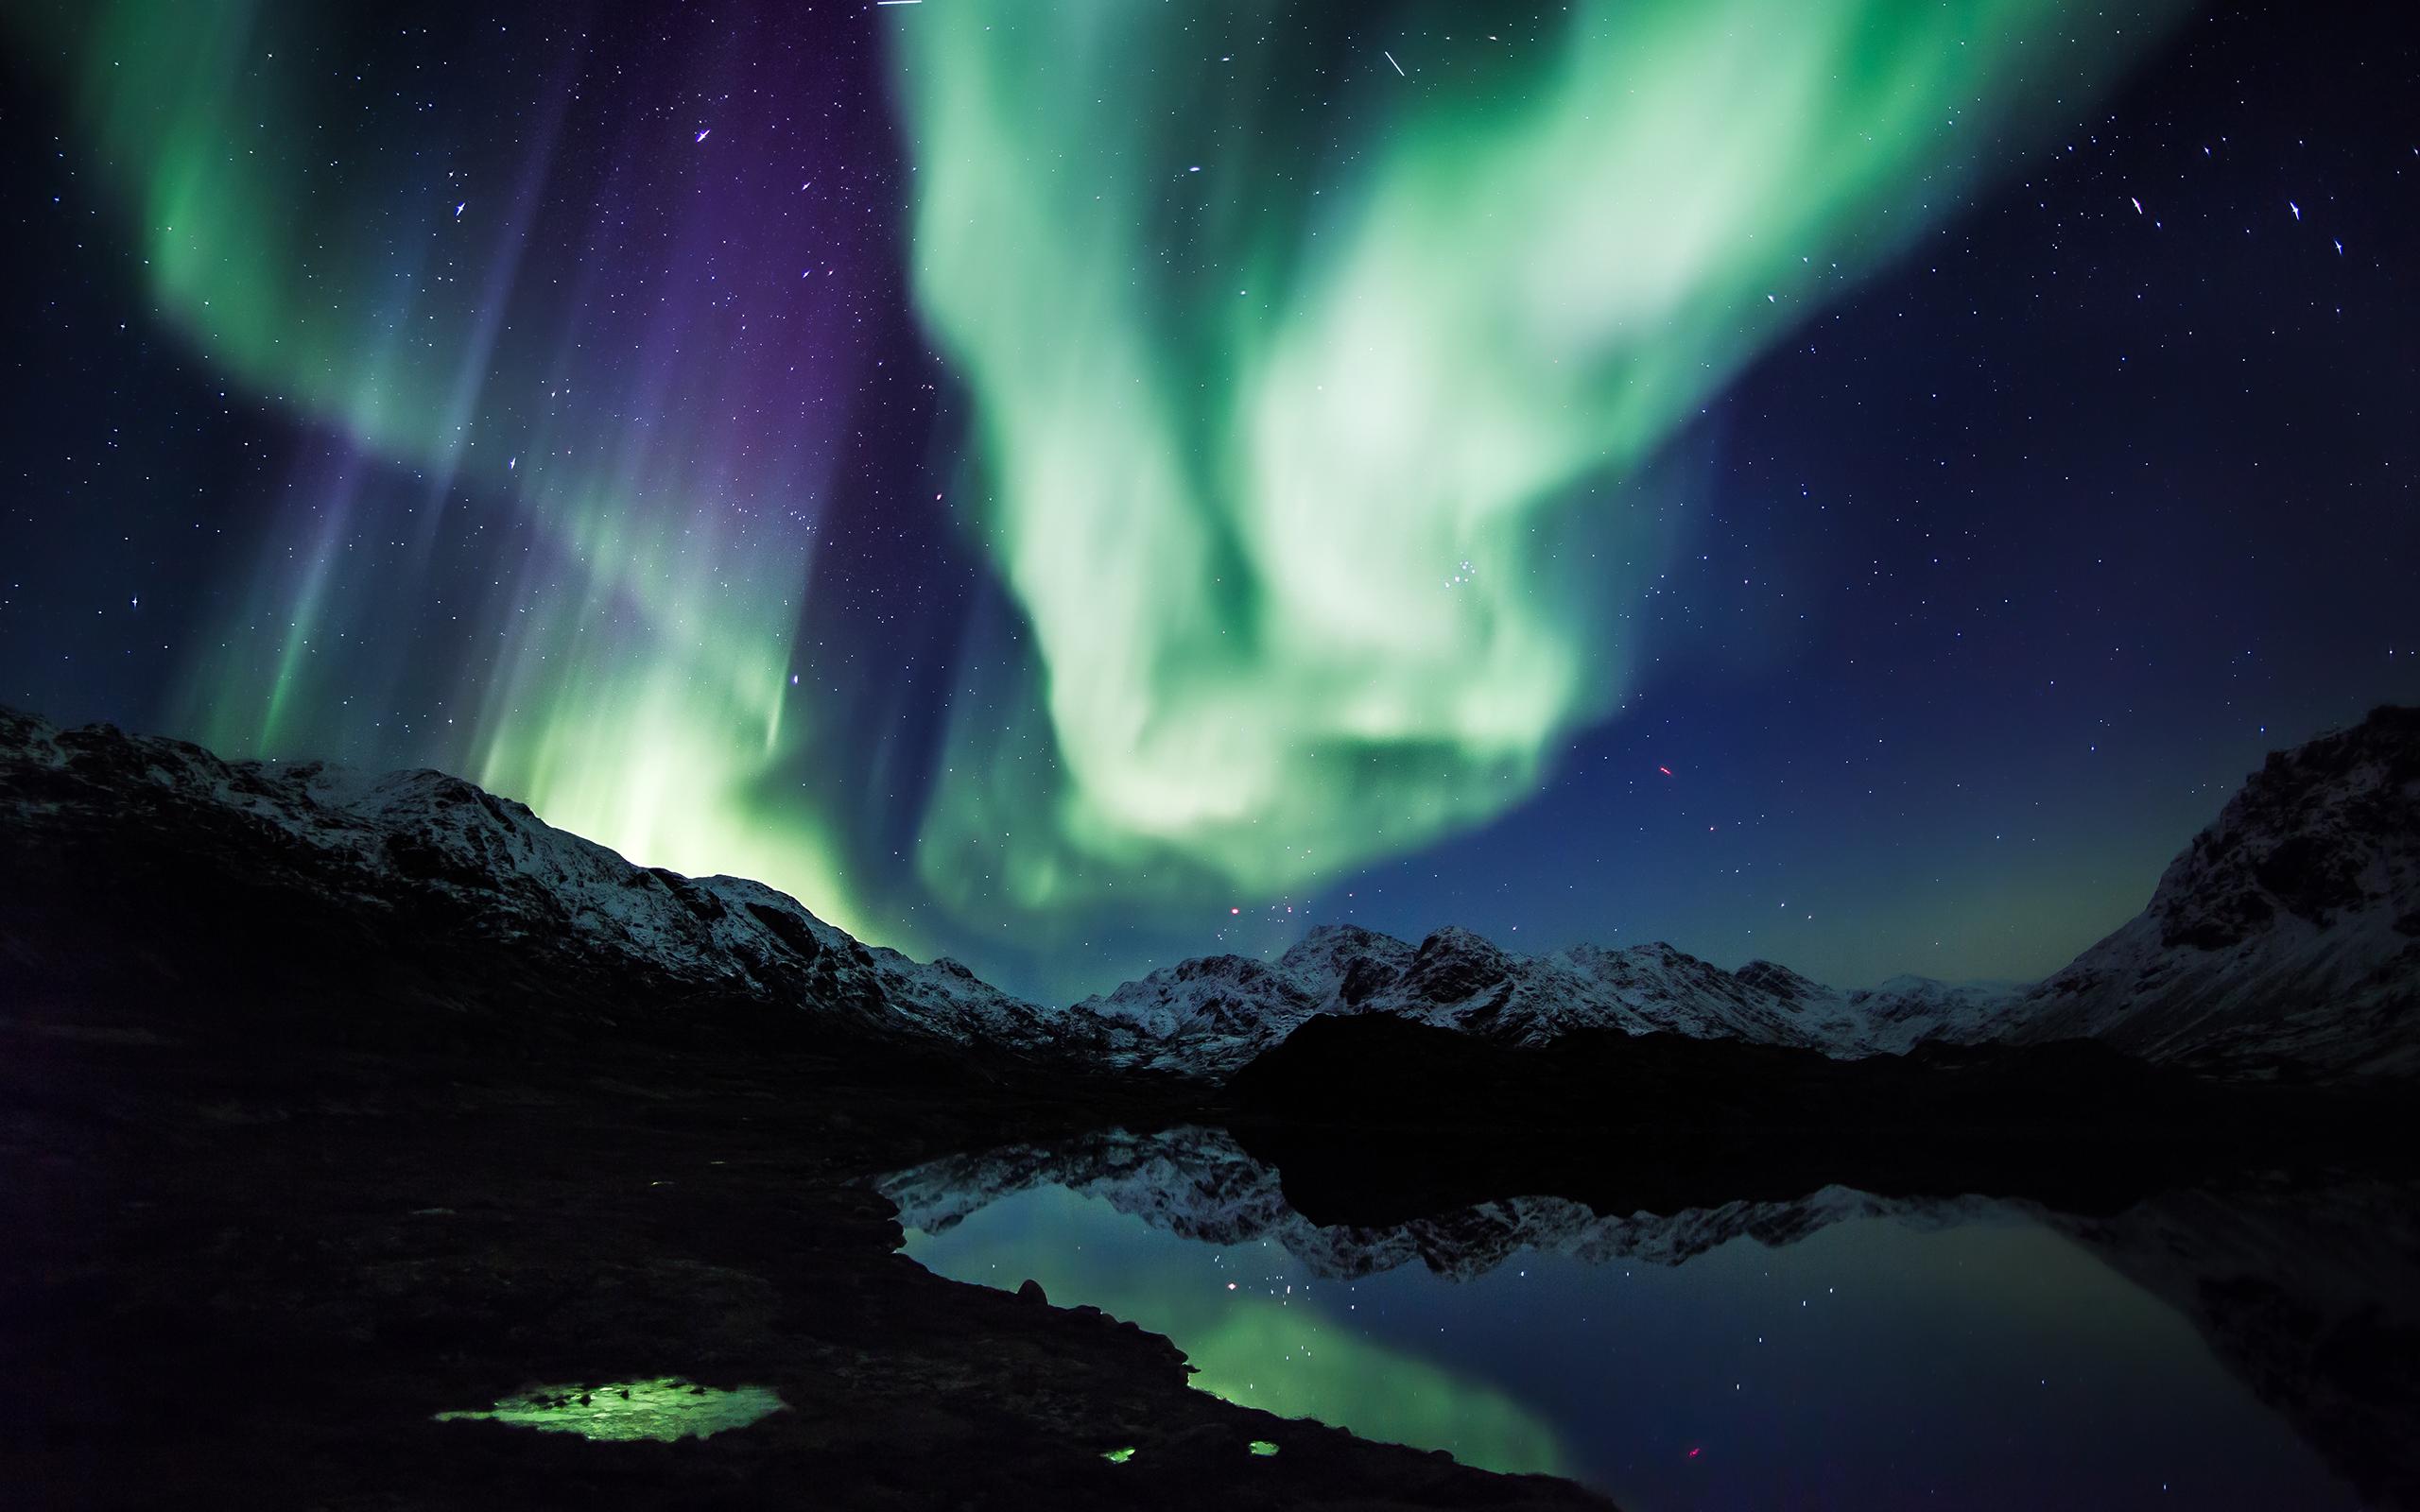 northern lights wallpaper 4k - photo #10